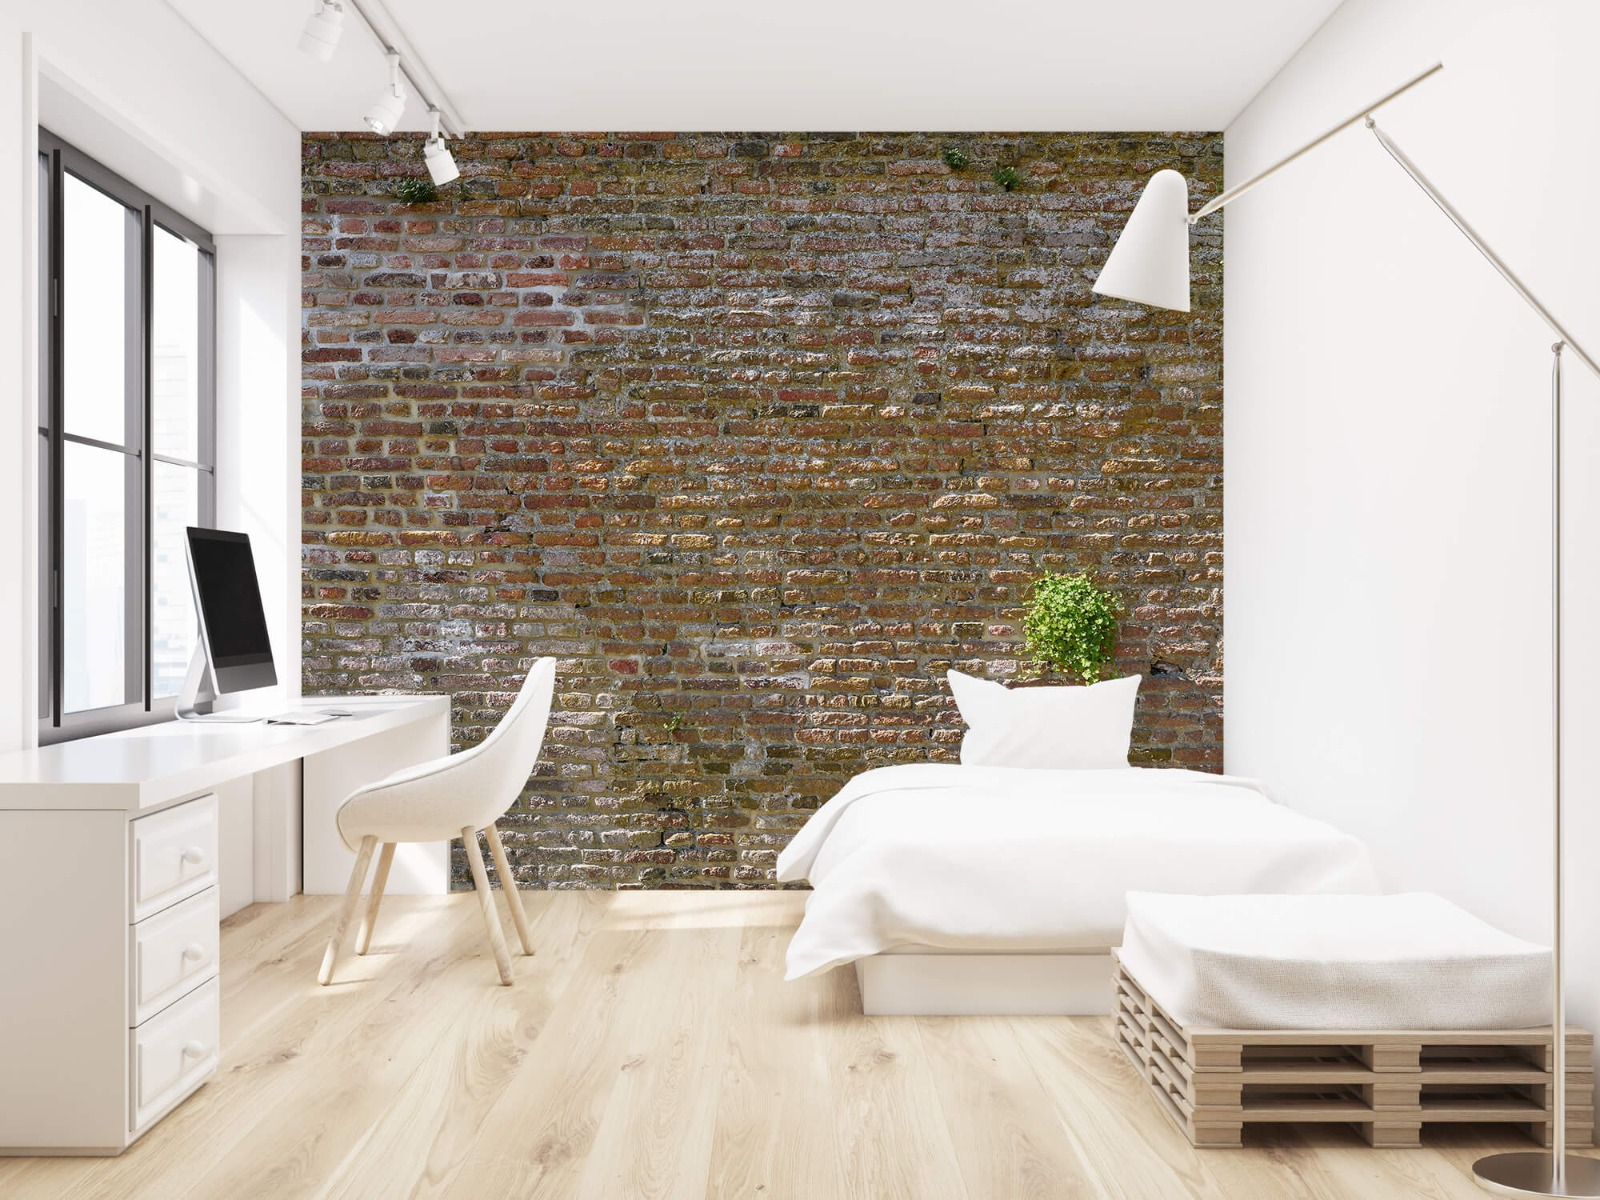 Stenen - Oude stenen stadsmuur met plantjes 22